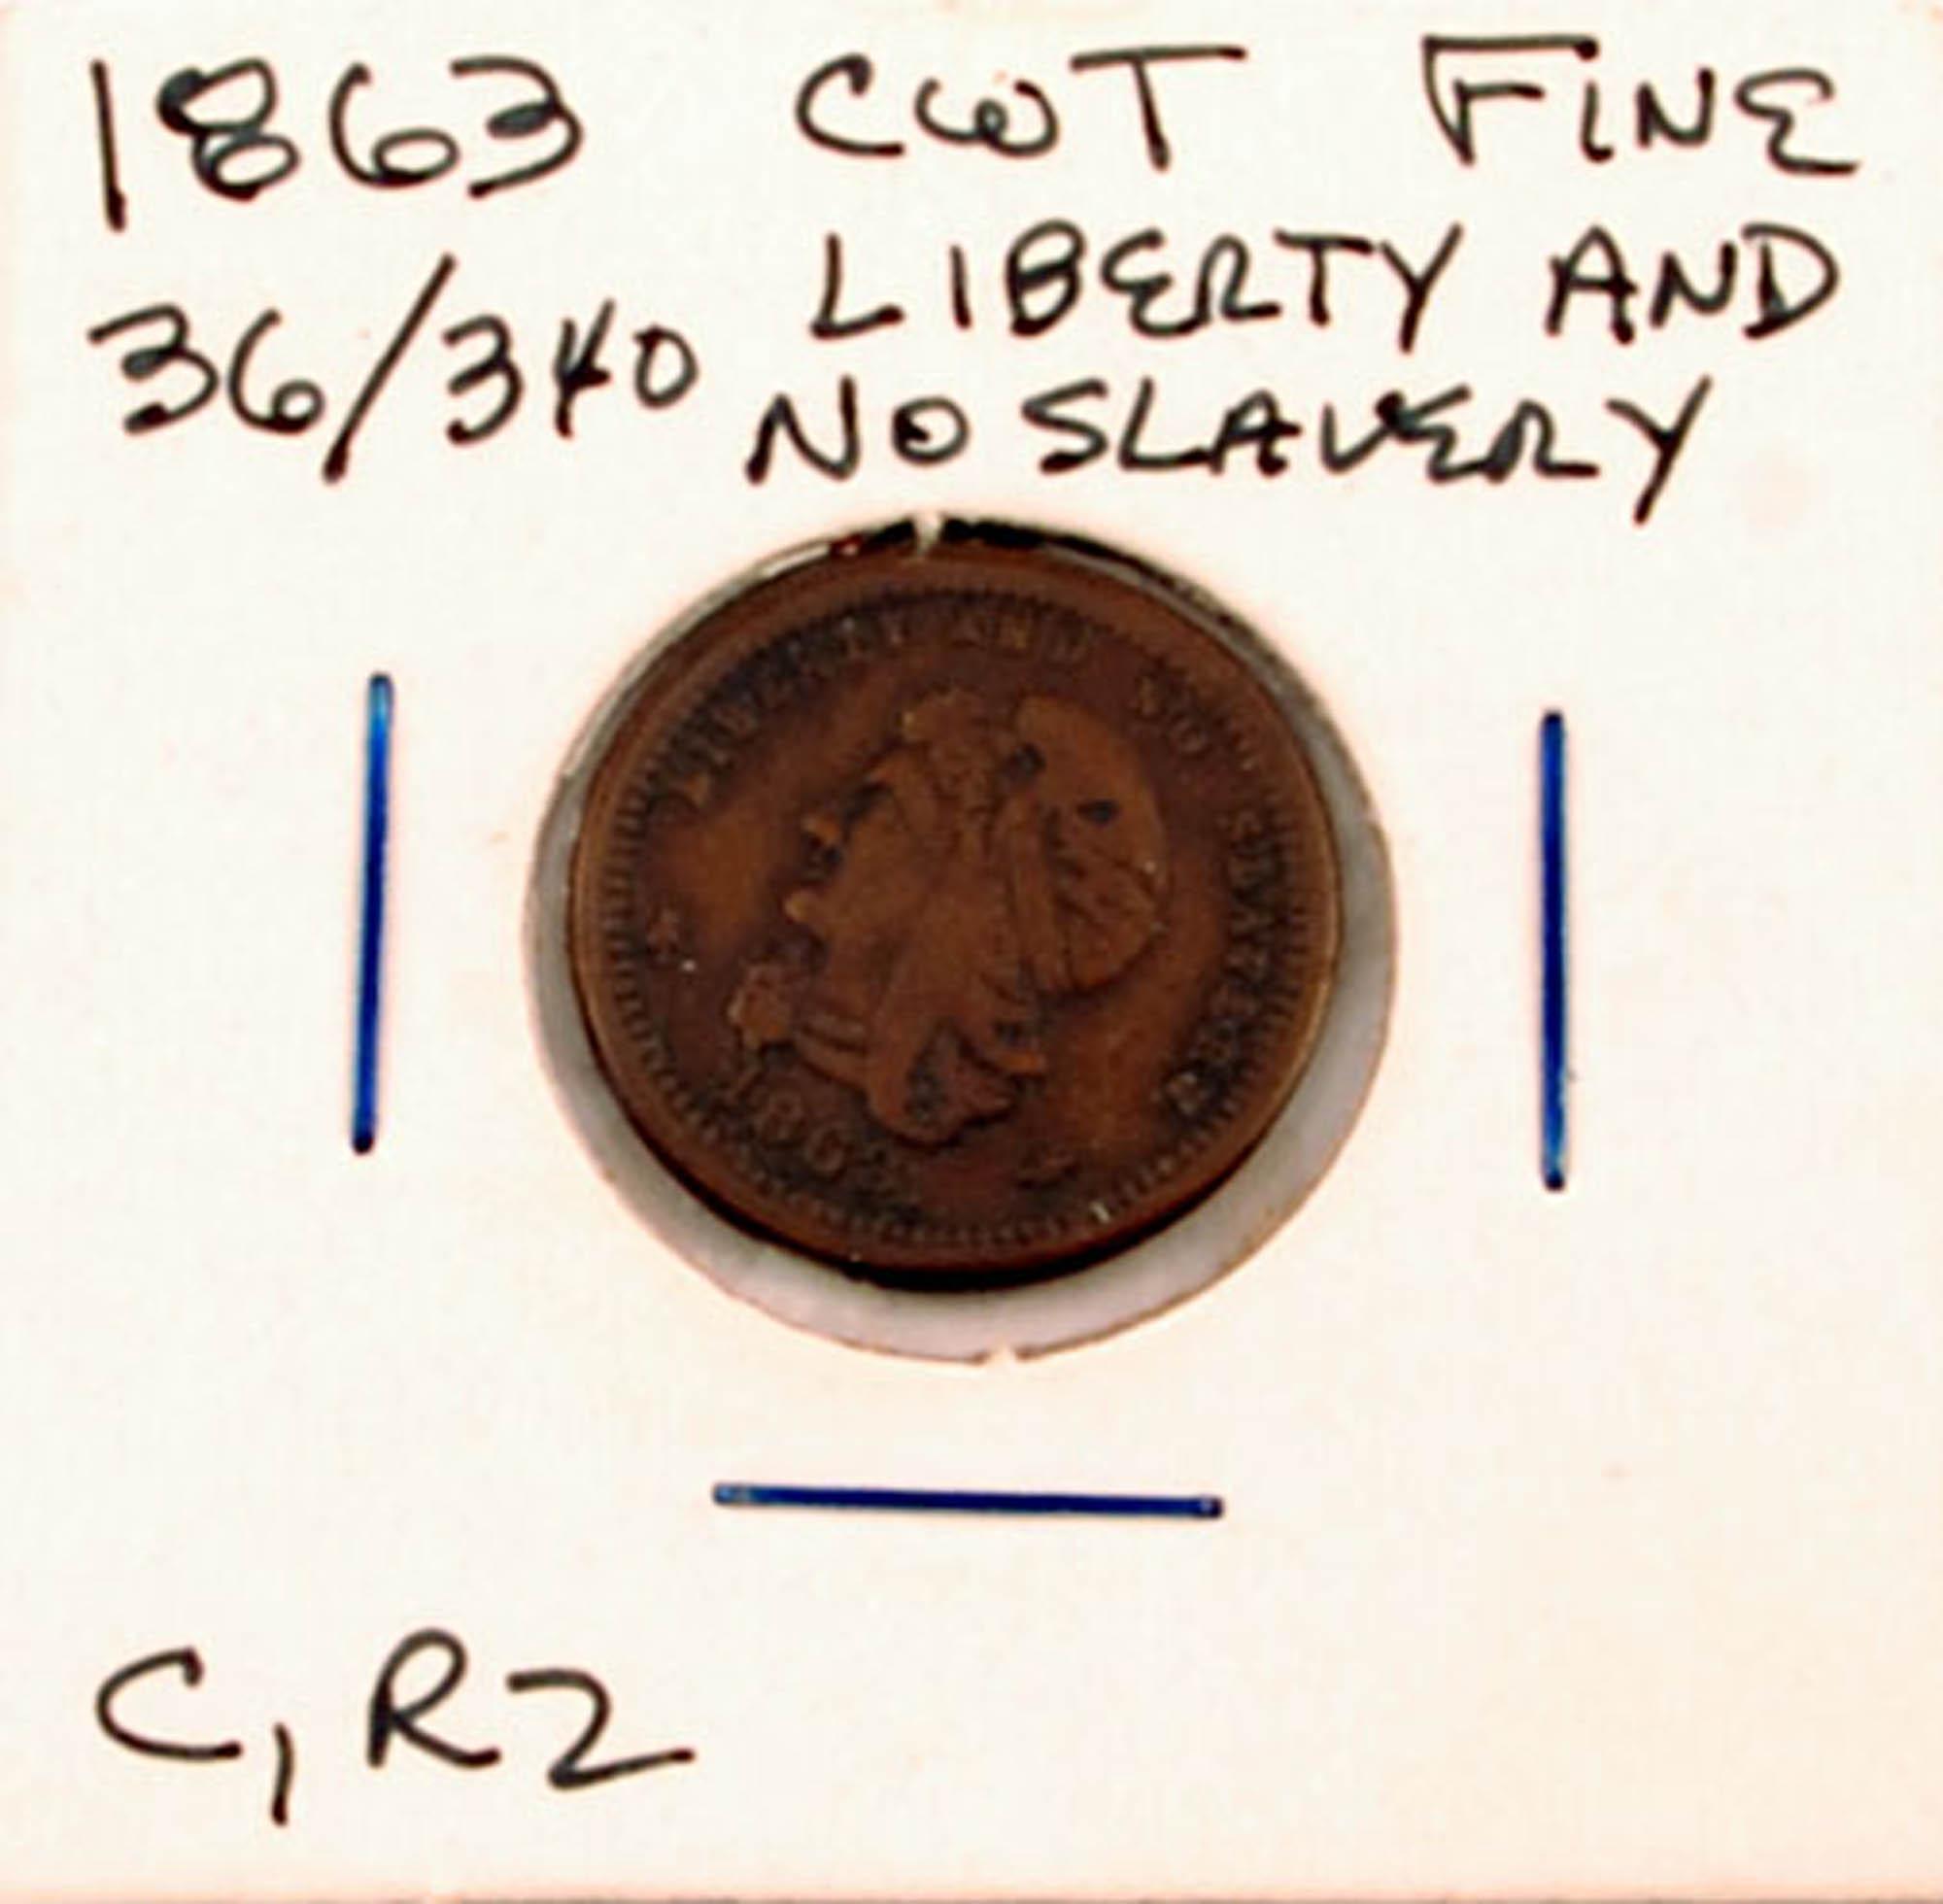 Anti-slavery token